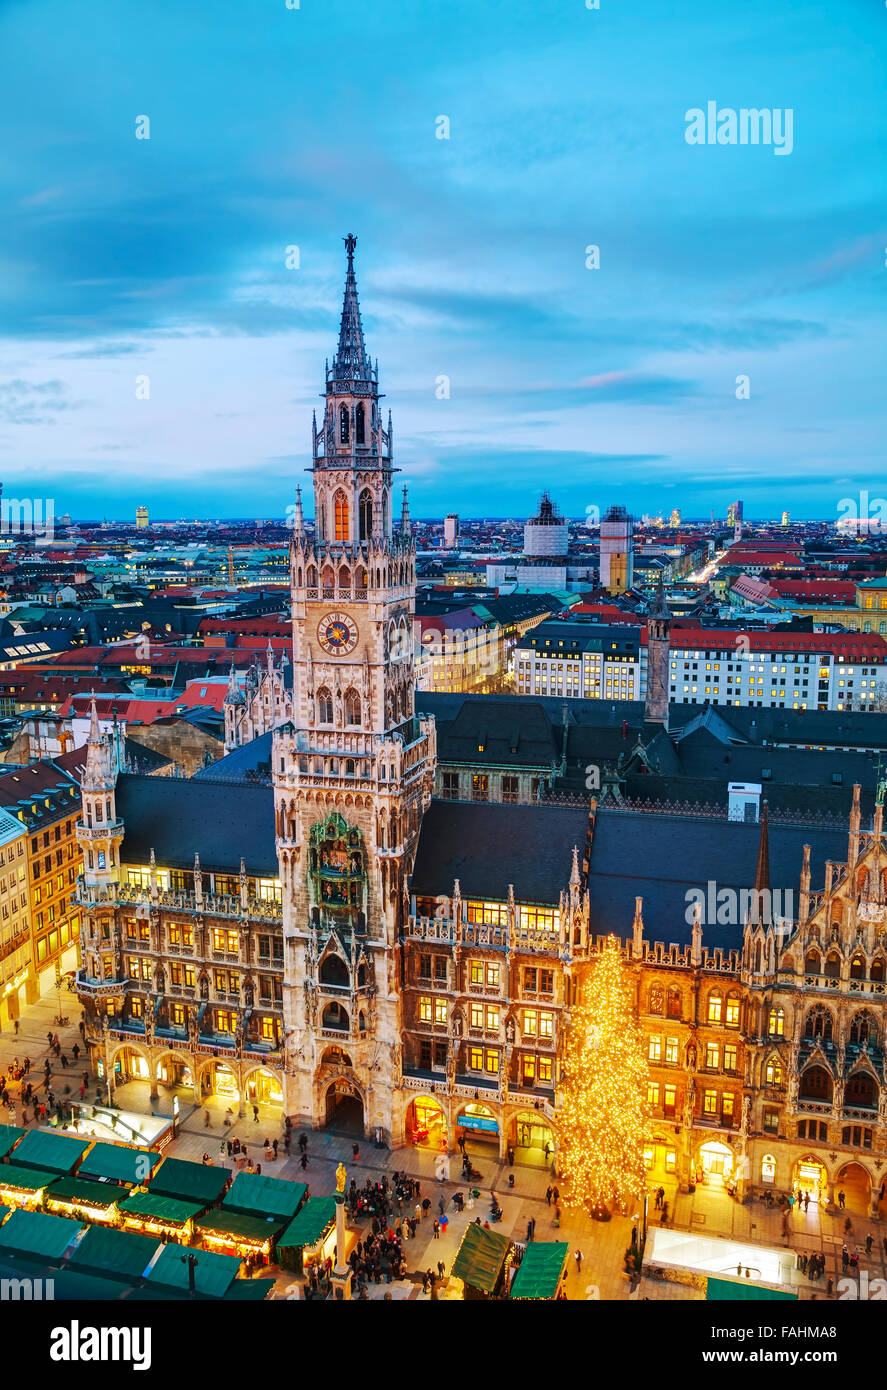 MUNICH - 30 de noviembre: Vista aérea de la plaza Marienplatz, el 30 de noviembre de 2015 en Munich. Es la Imagen De Stock